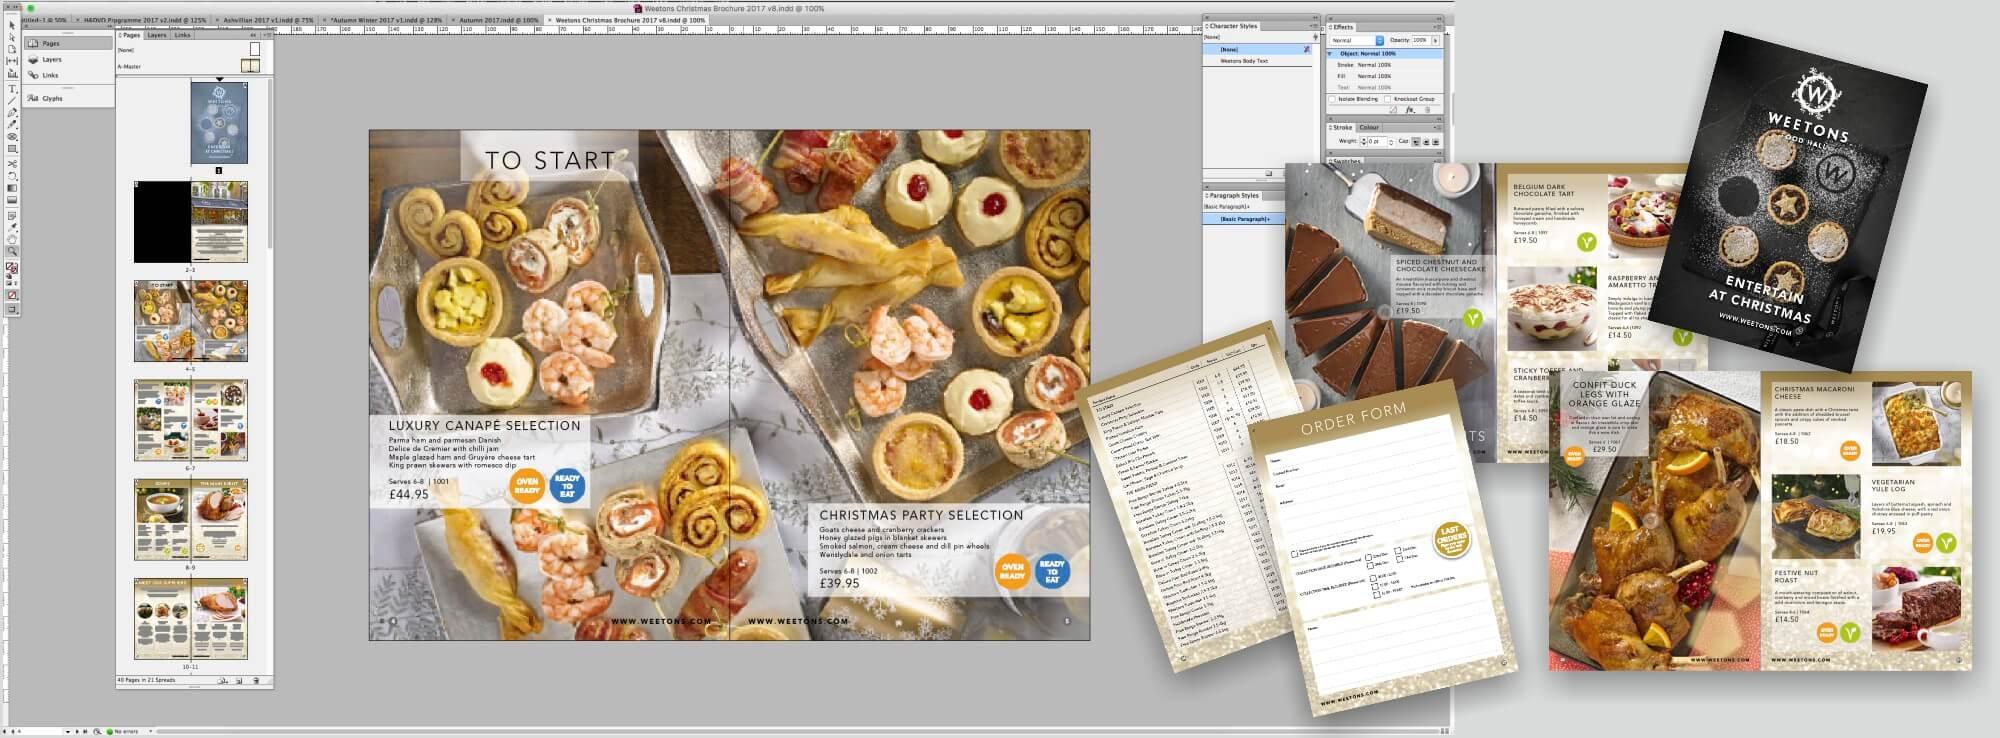 Weetons Christmas Brochure Design & Print